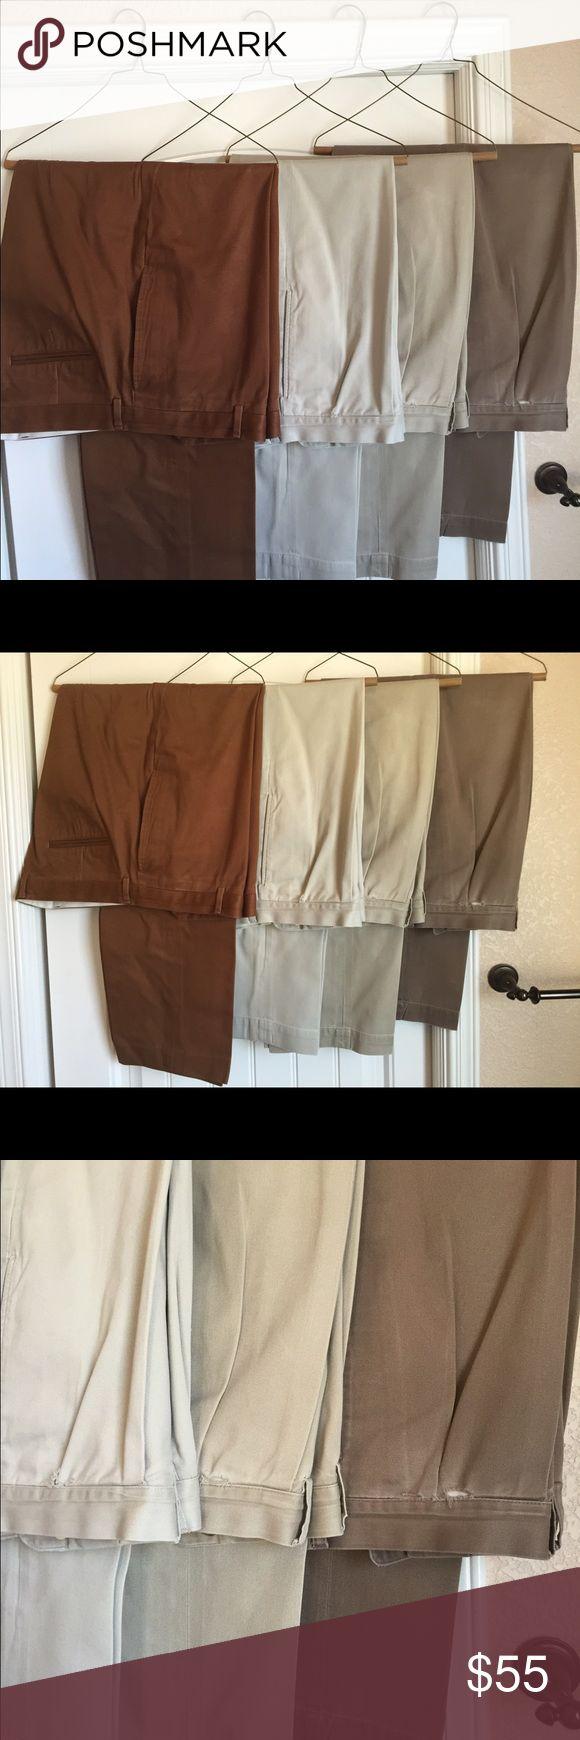 4 Pair Ralp Lauren Men's Dress Pant 4Psir Men's Ralp Lauren Dress Pants. Slightly Used. Ralph Lauren Pants